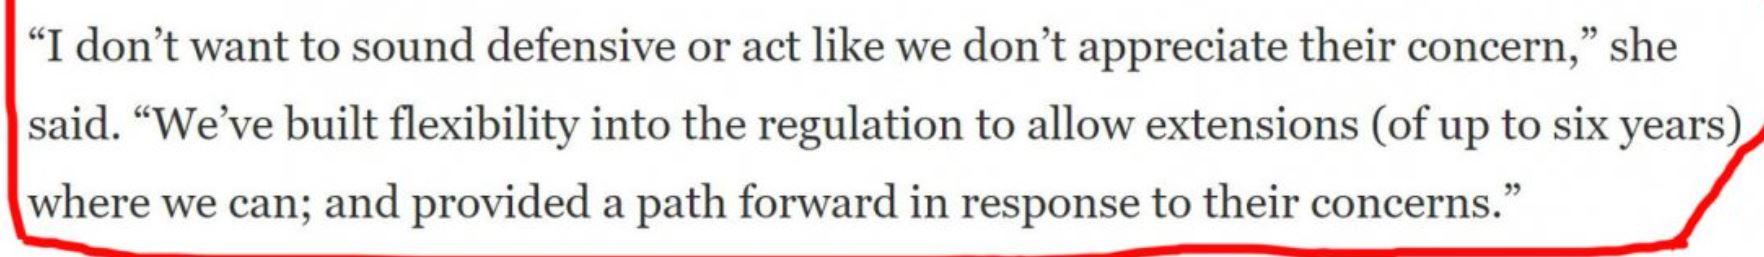 CARB final paragraph..JPG